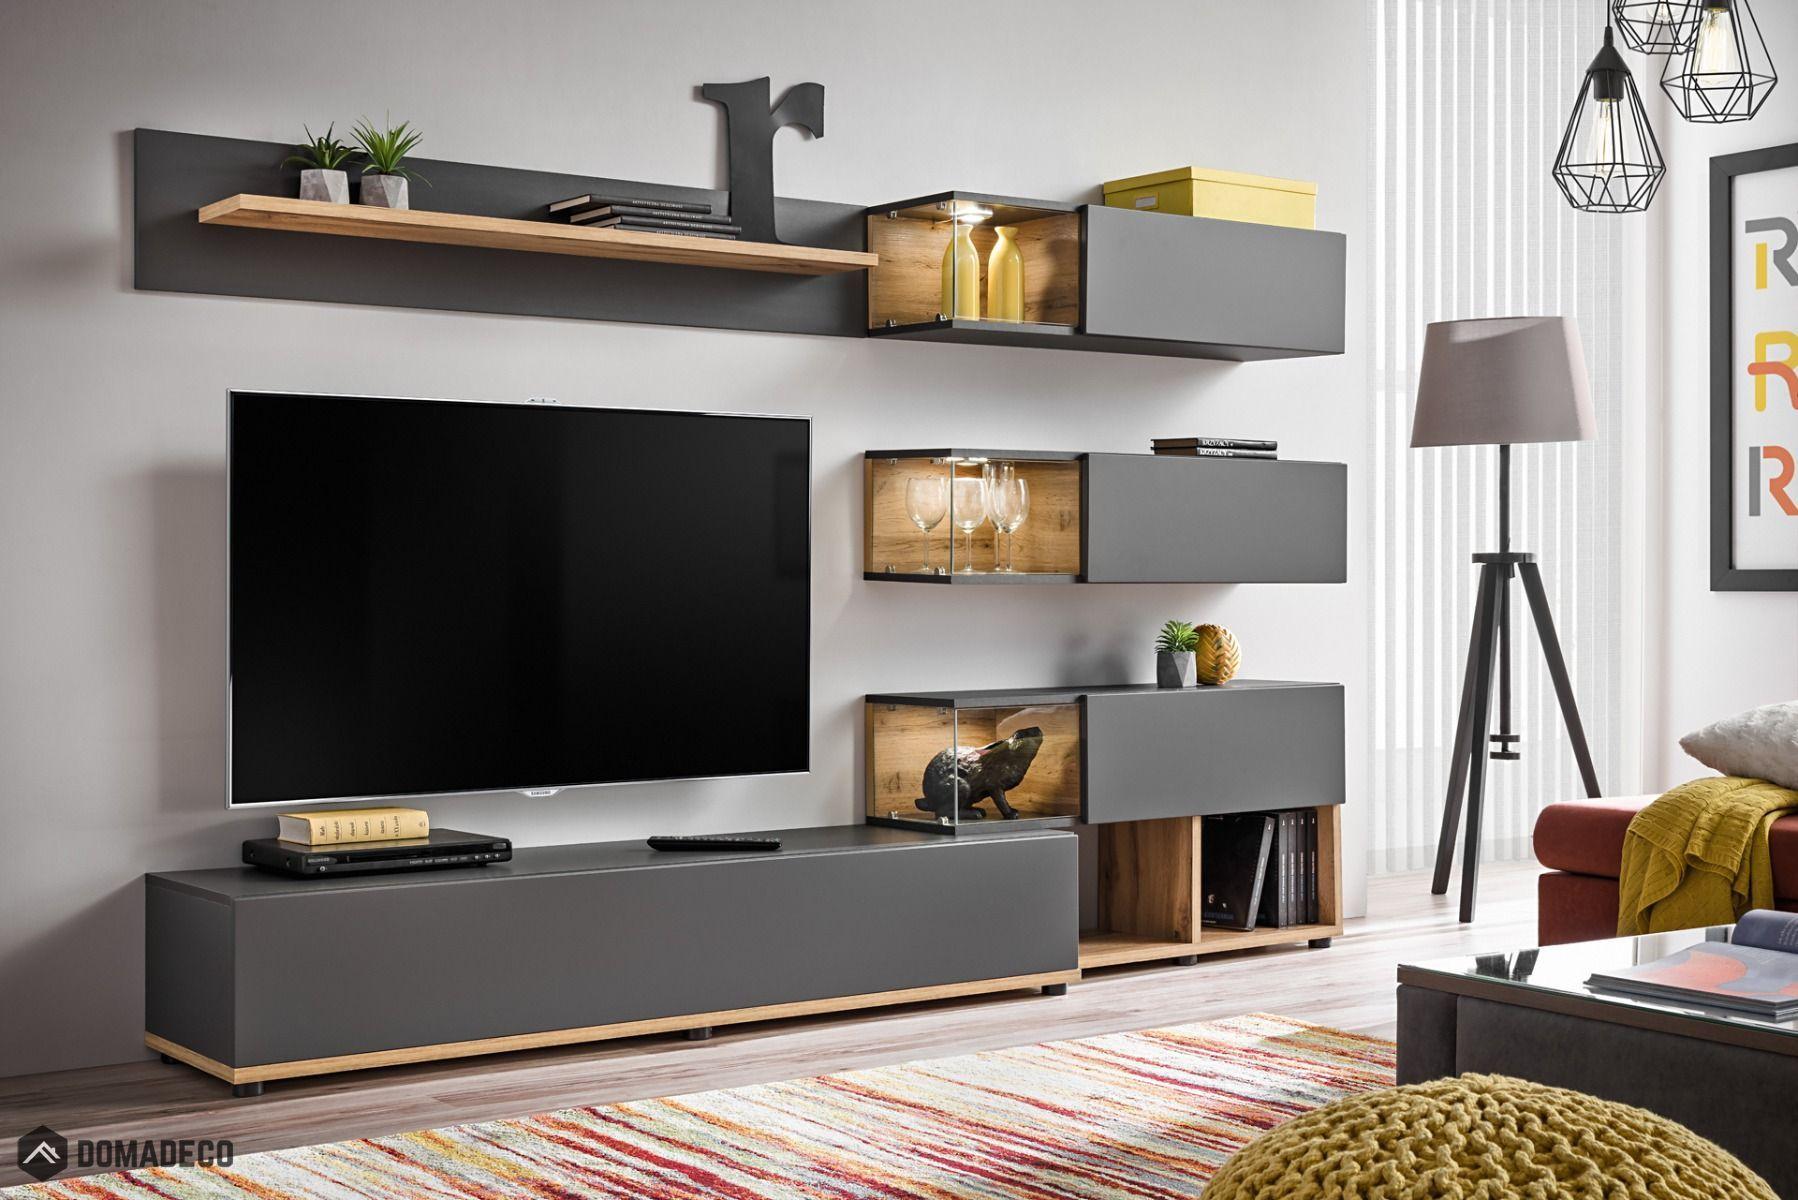 simi anthracite meuble tv led